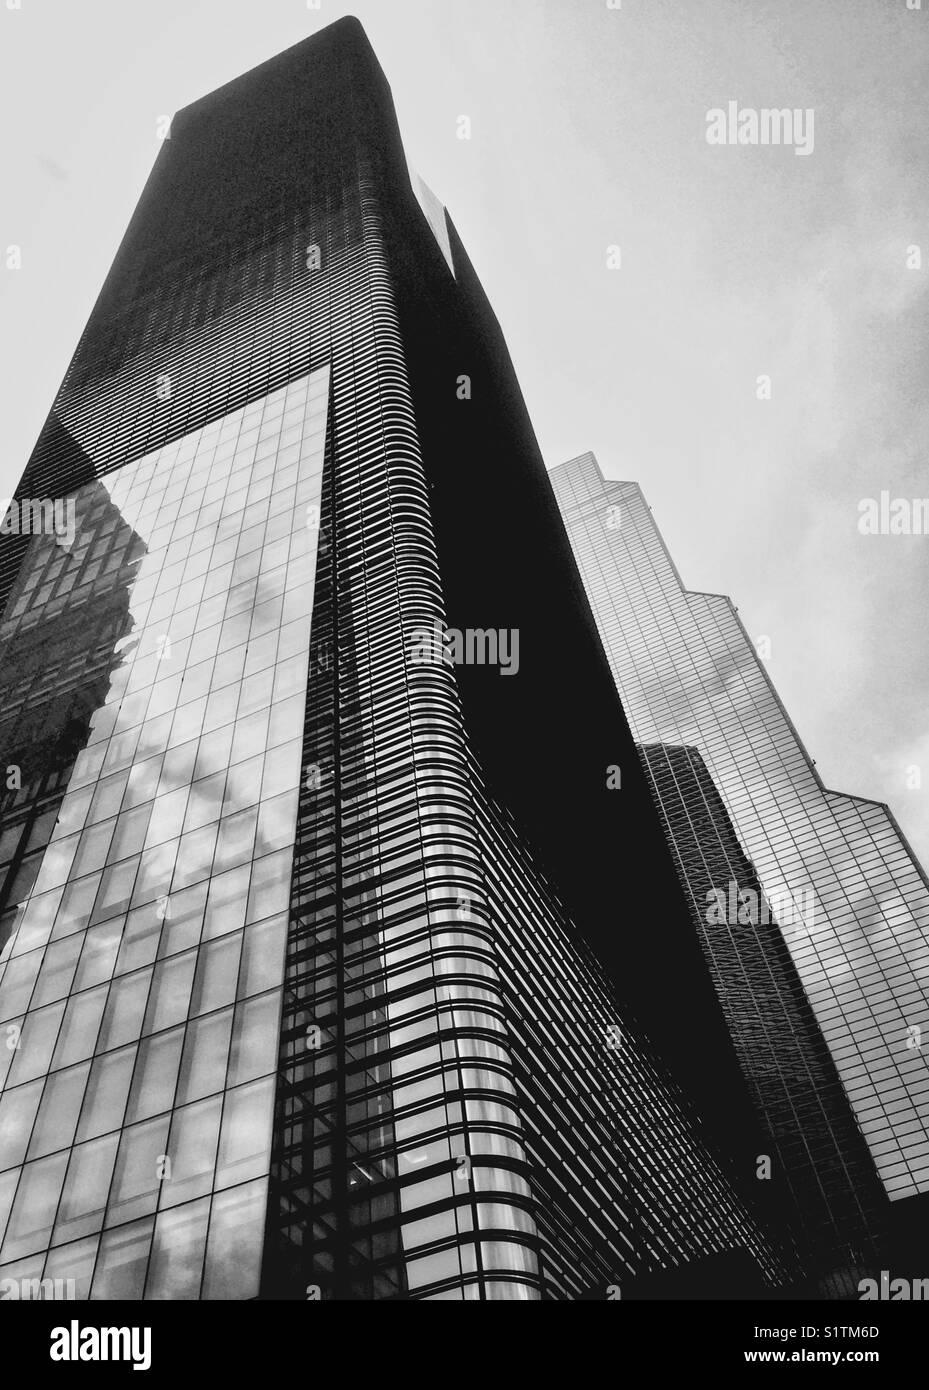 sky scraper - Stock Image